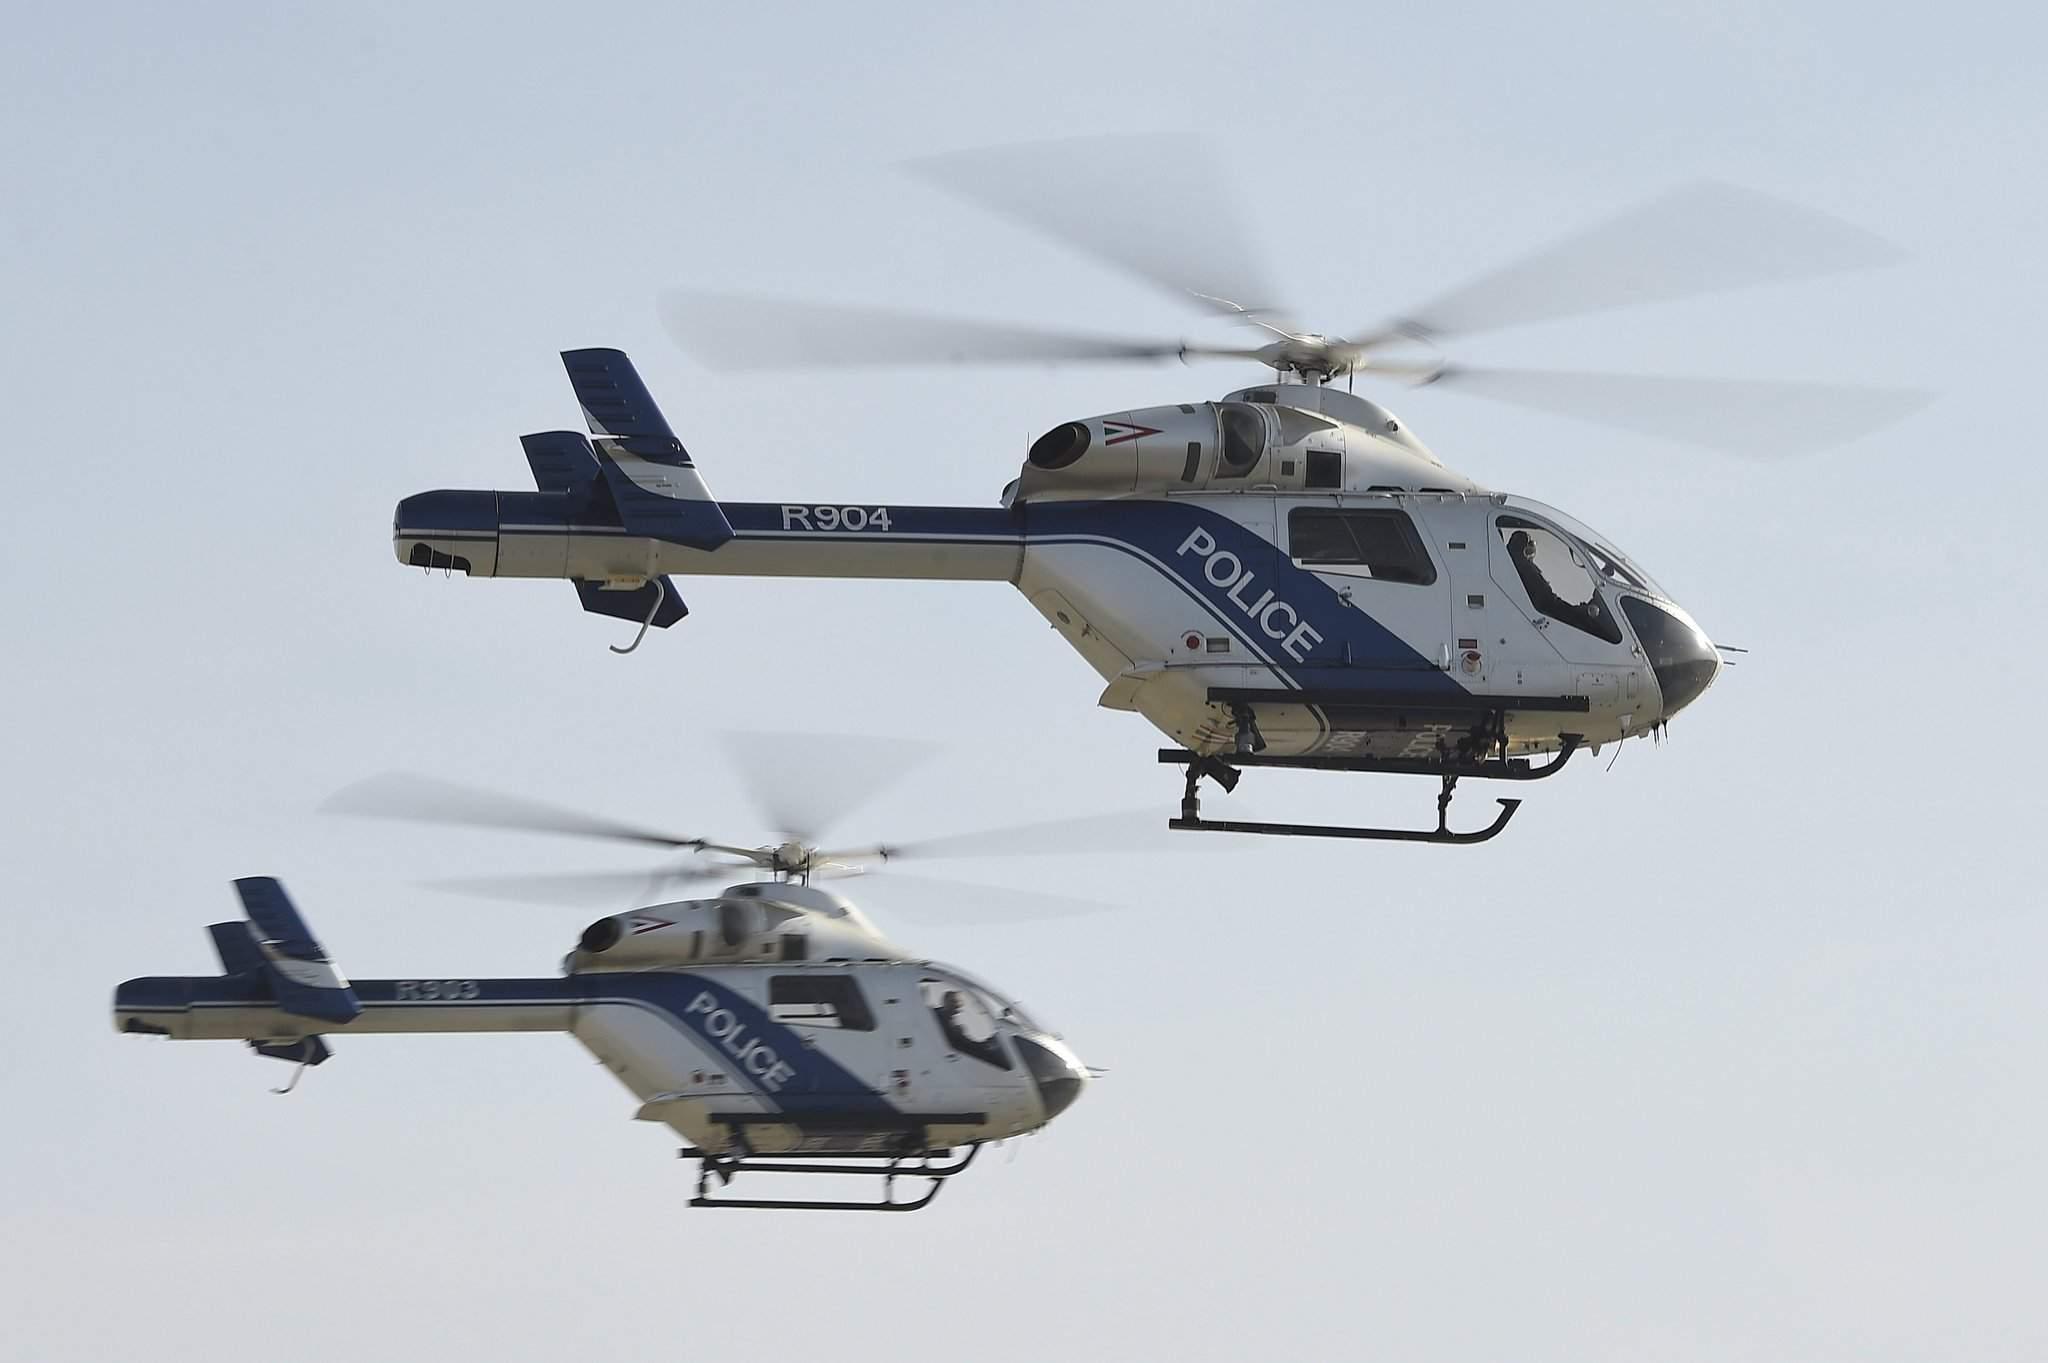 Helicopter center Moscow opened in Myakininskaya floodplain 72